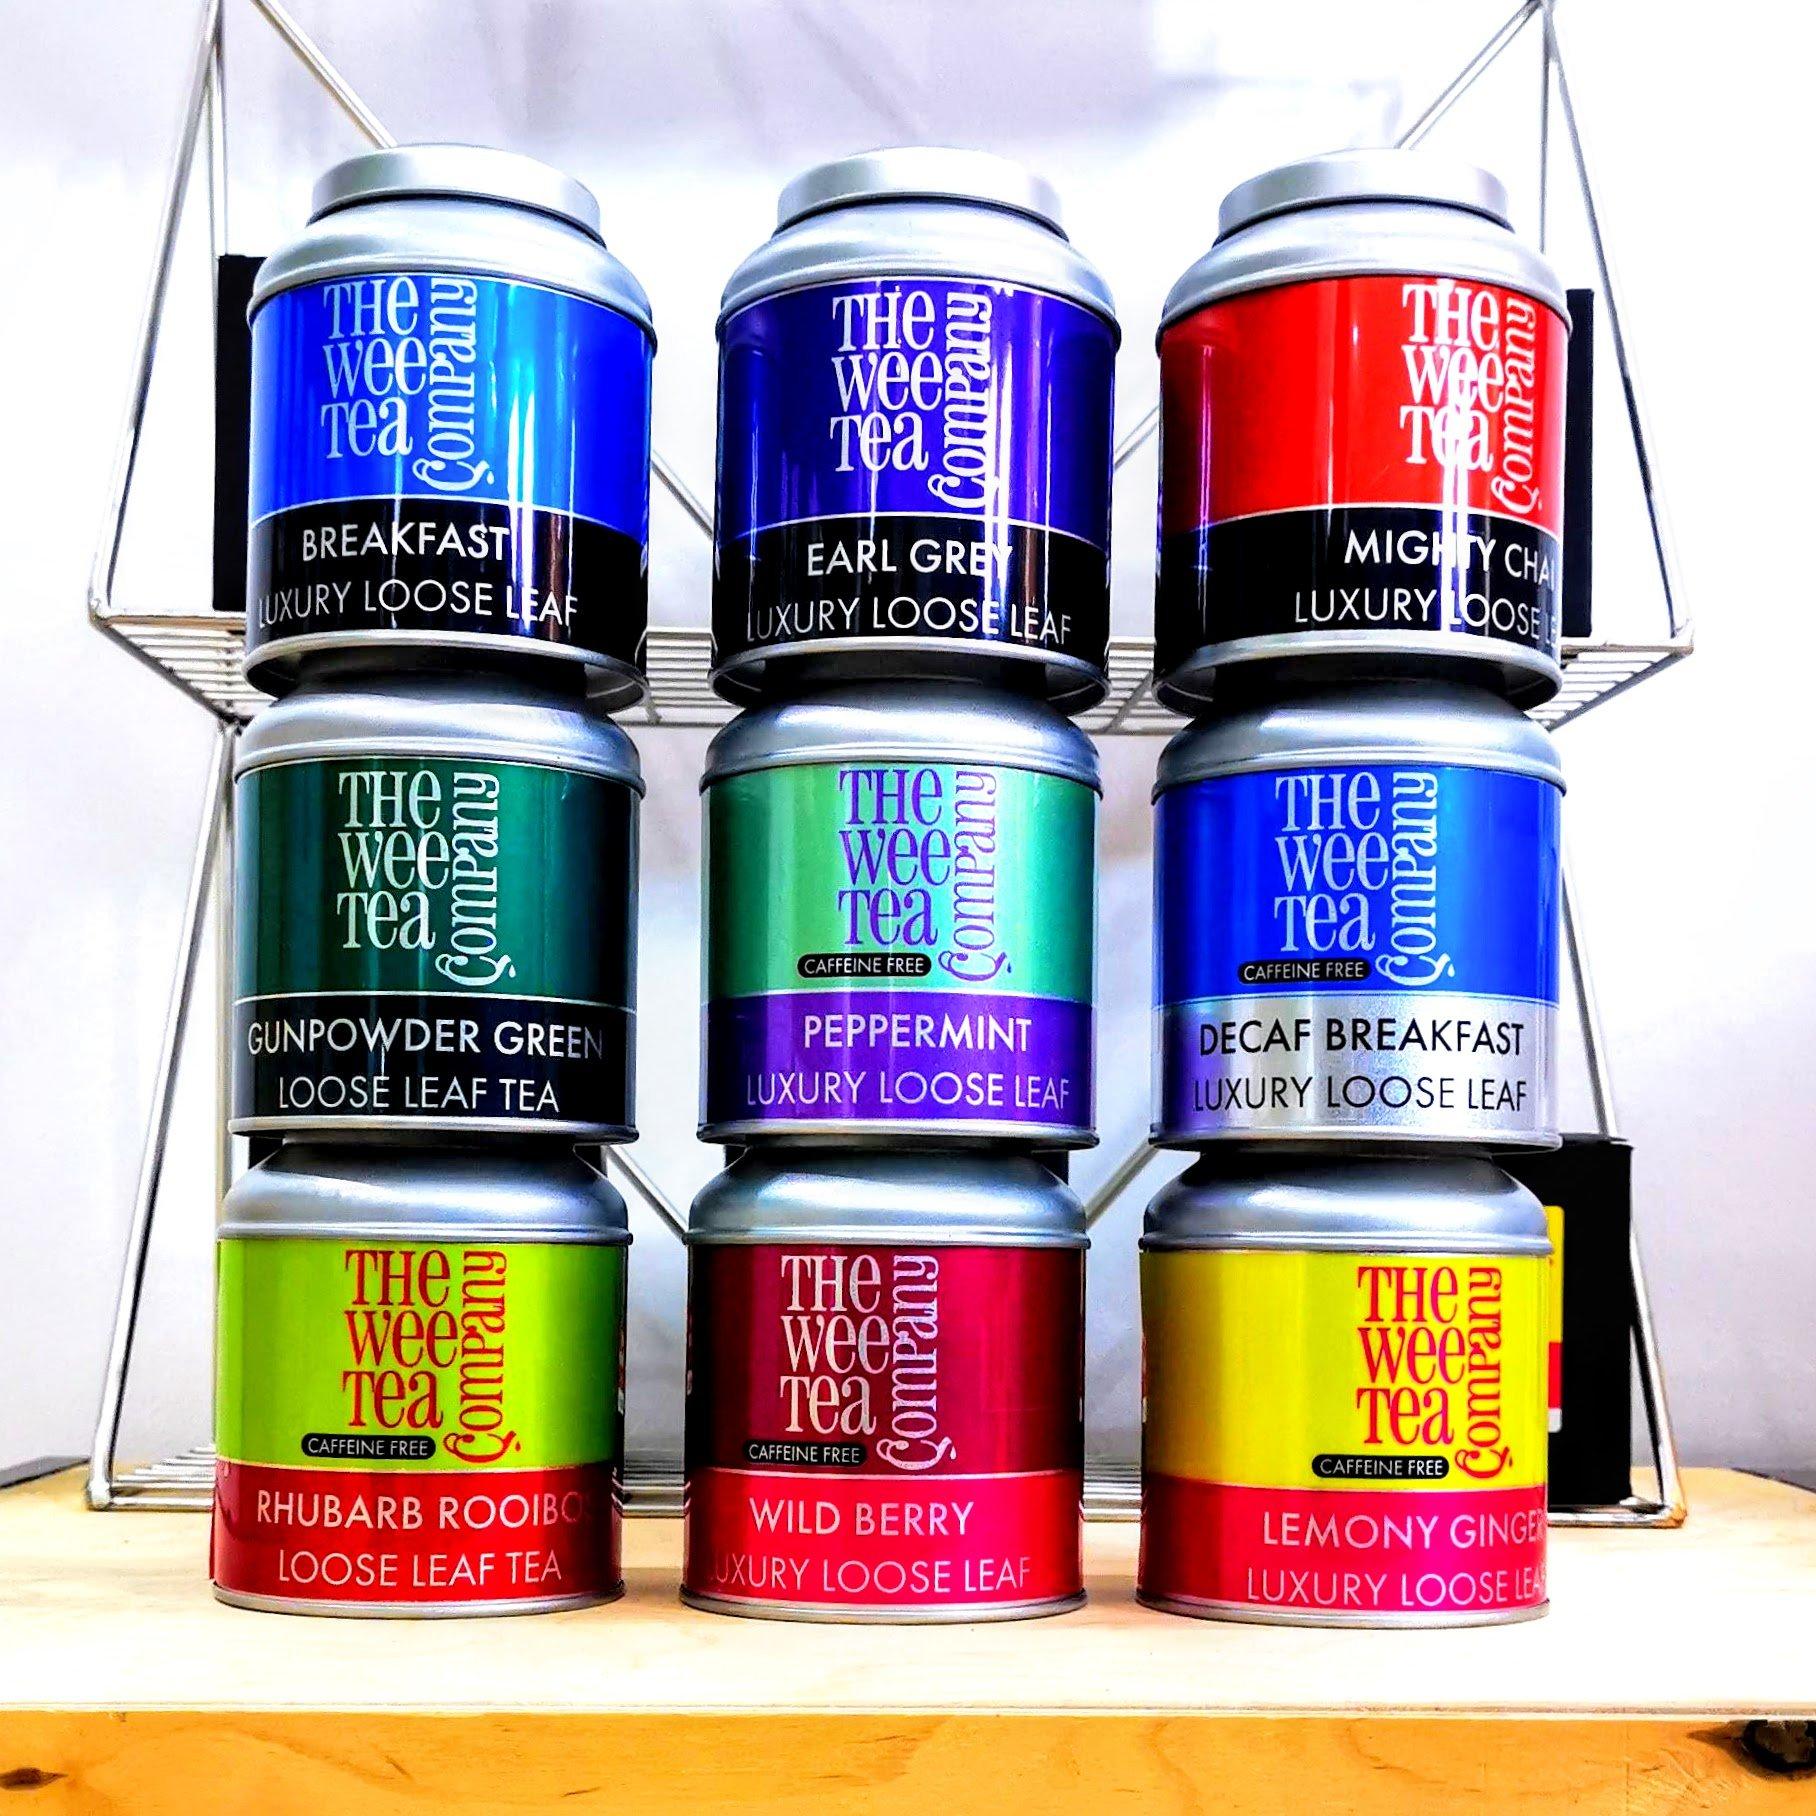 Wholesale Tea Starter Kits from The Wee Tea Company